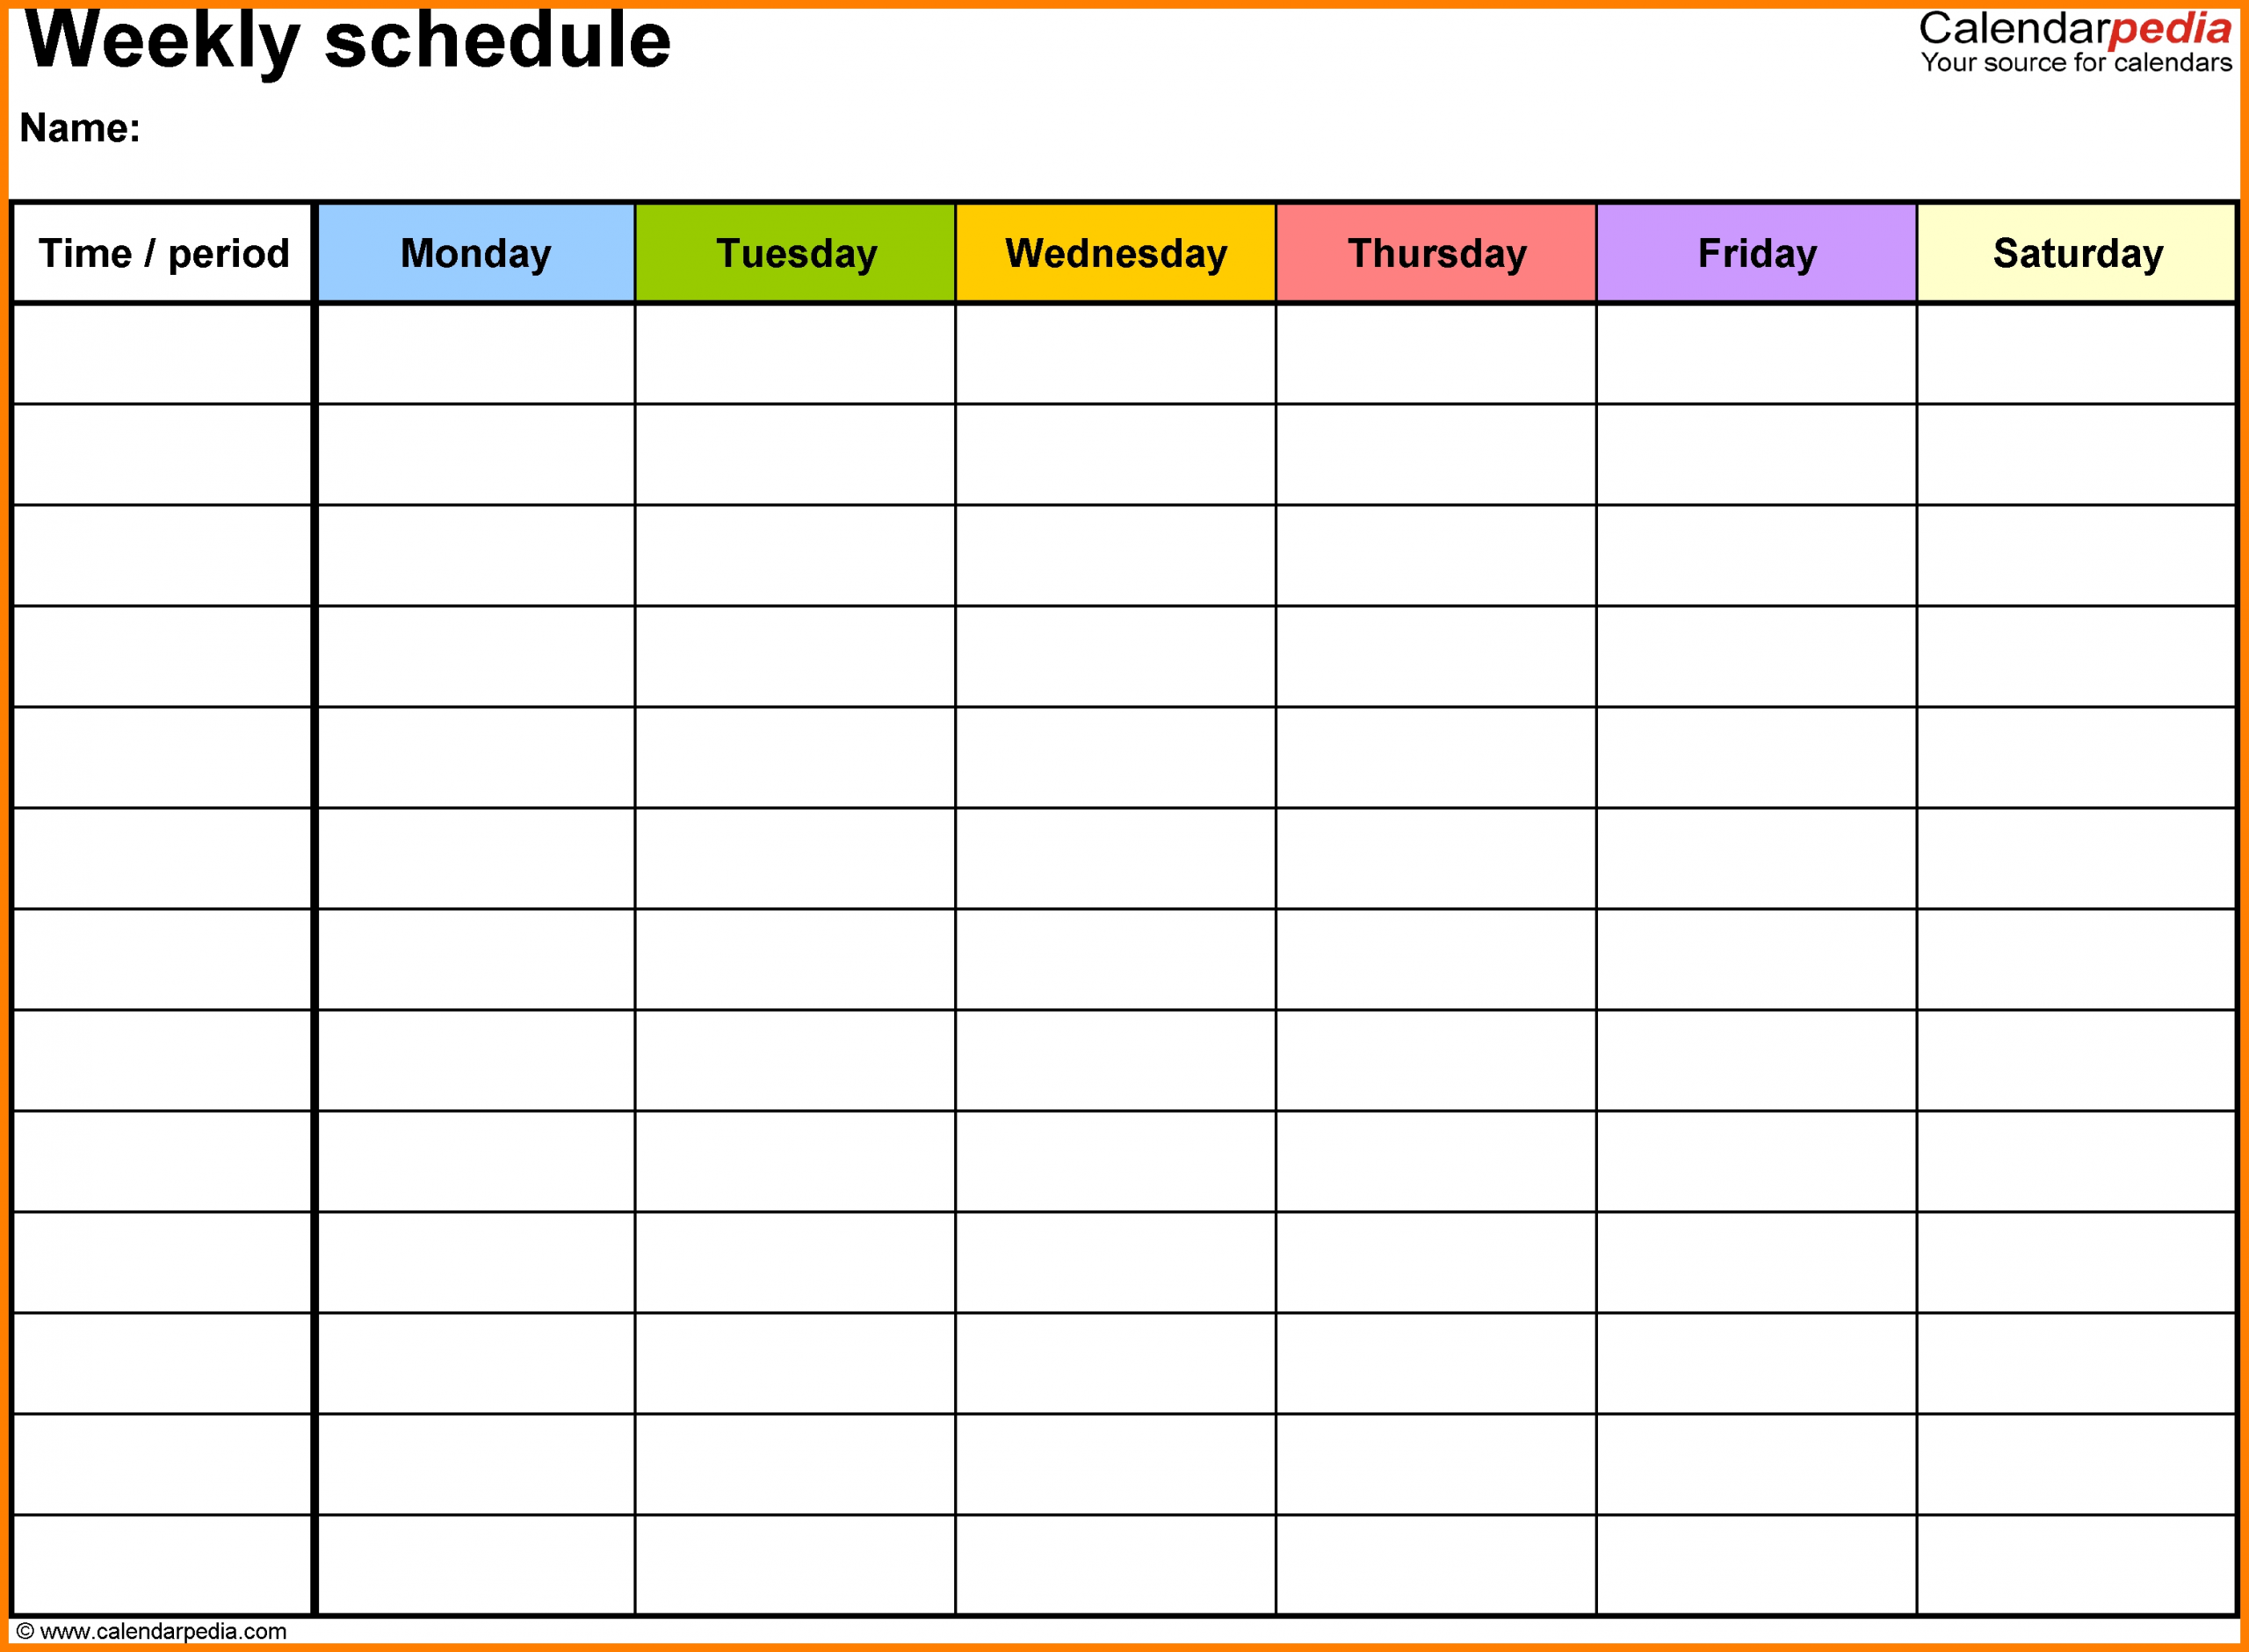 Printable Weekly Calendar With Time Slots - Calendar Weekly Calendar Template With Time Slots